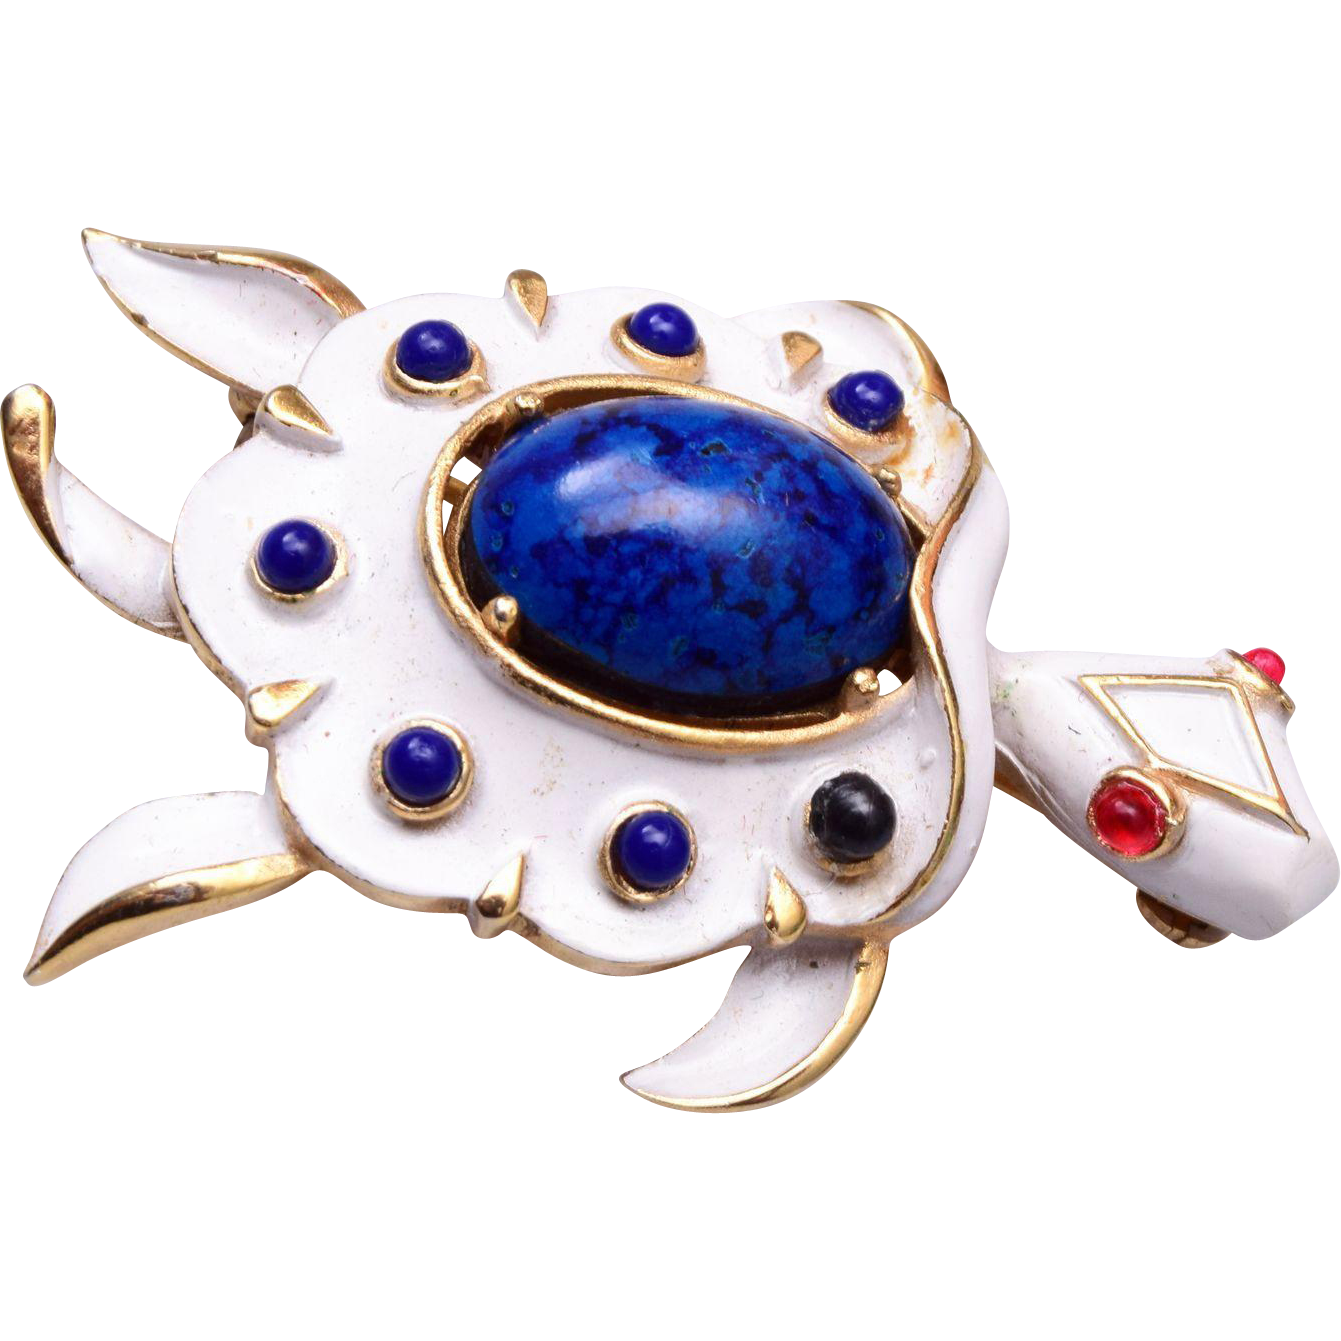 Trifari Blue and White Turtle Brooch